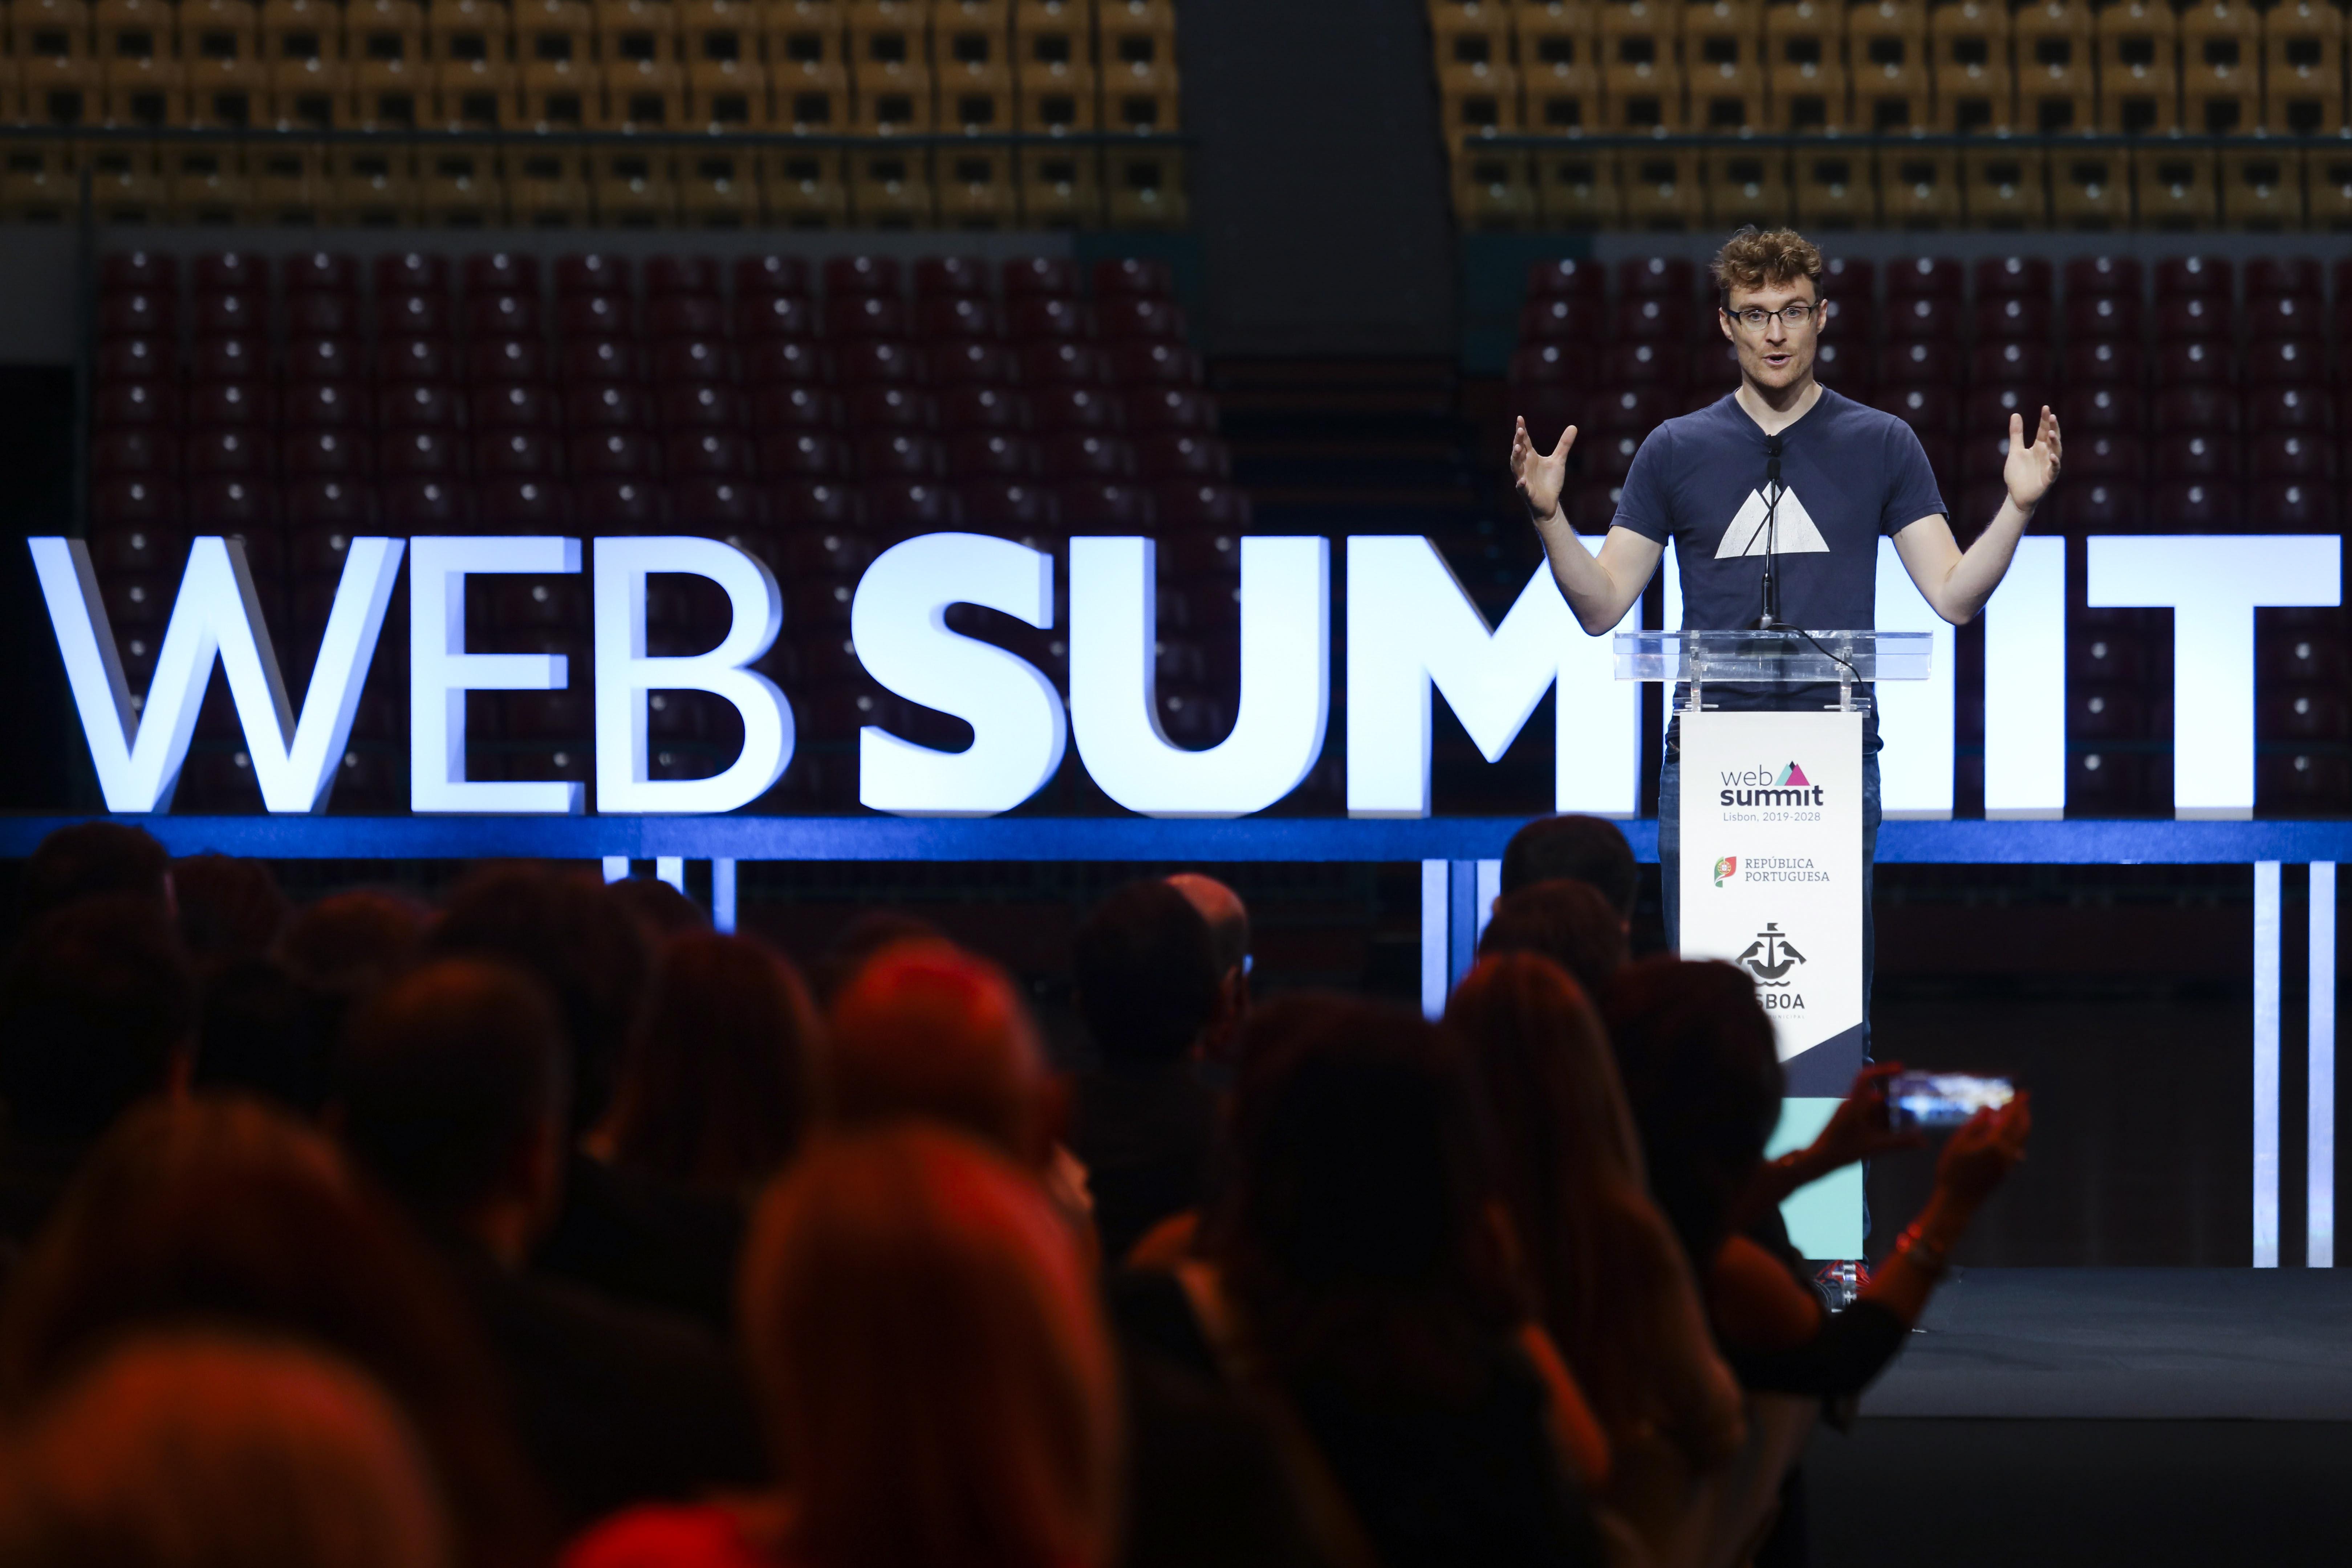 Web Summit esgotado mas ainda há bilhetes para estudantes